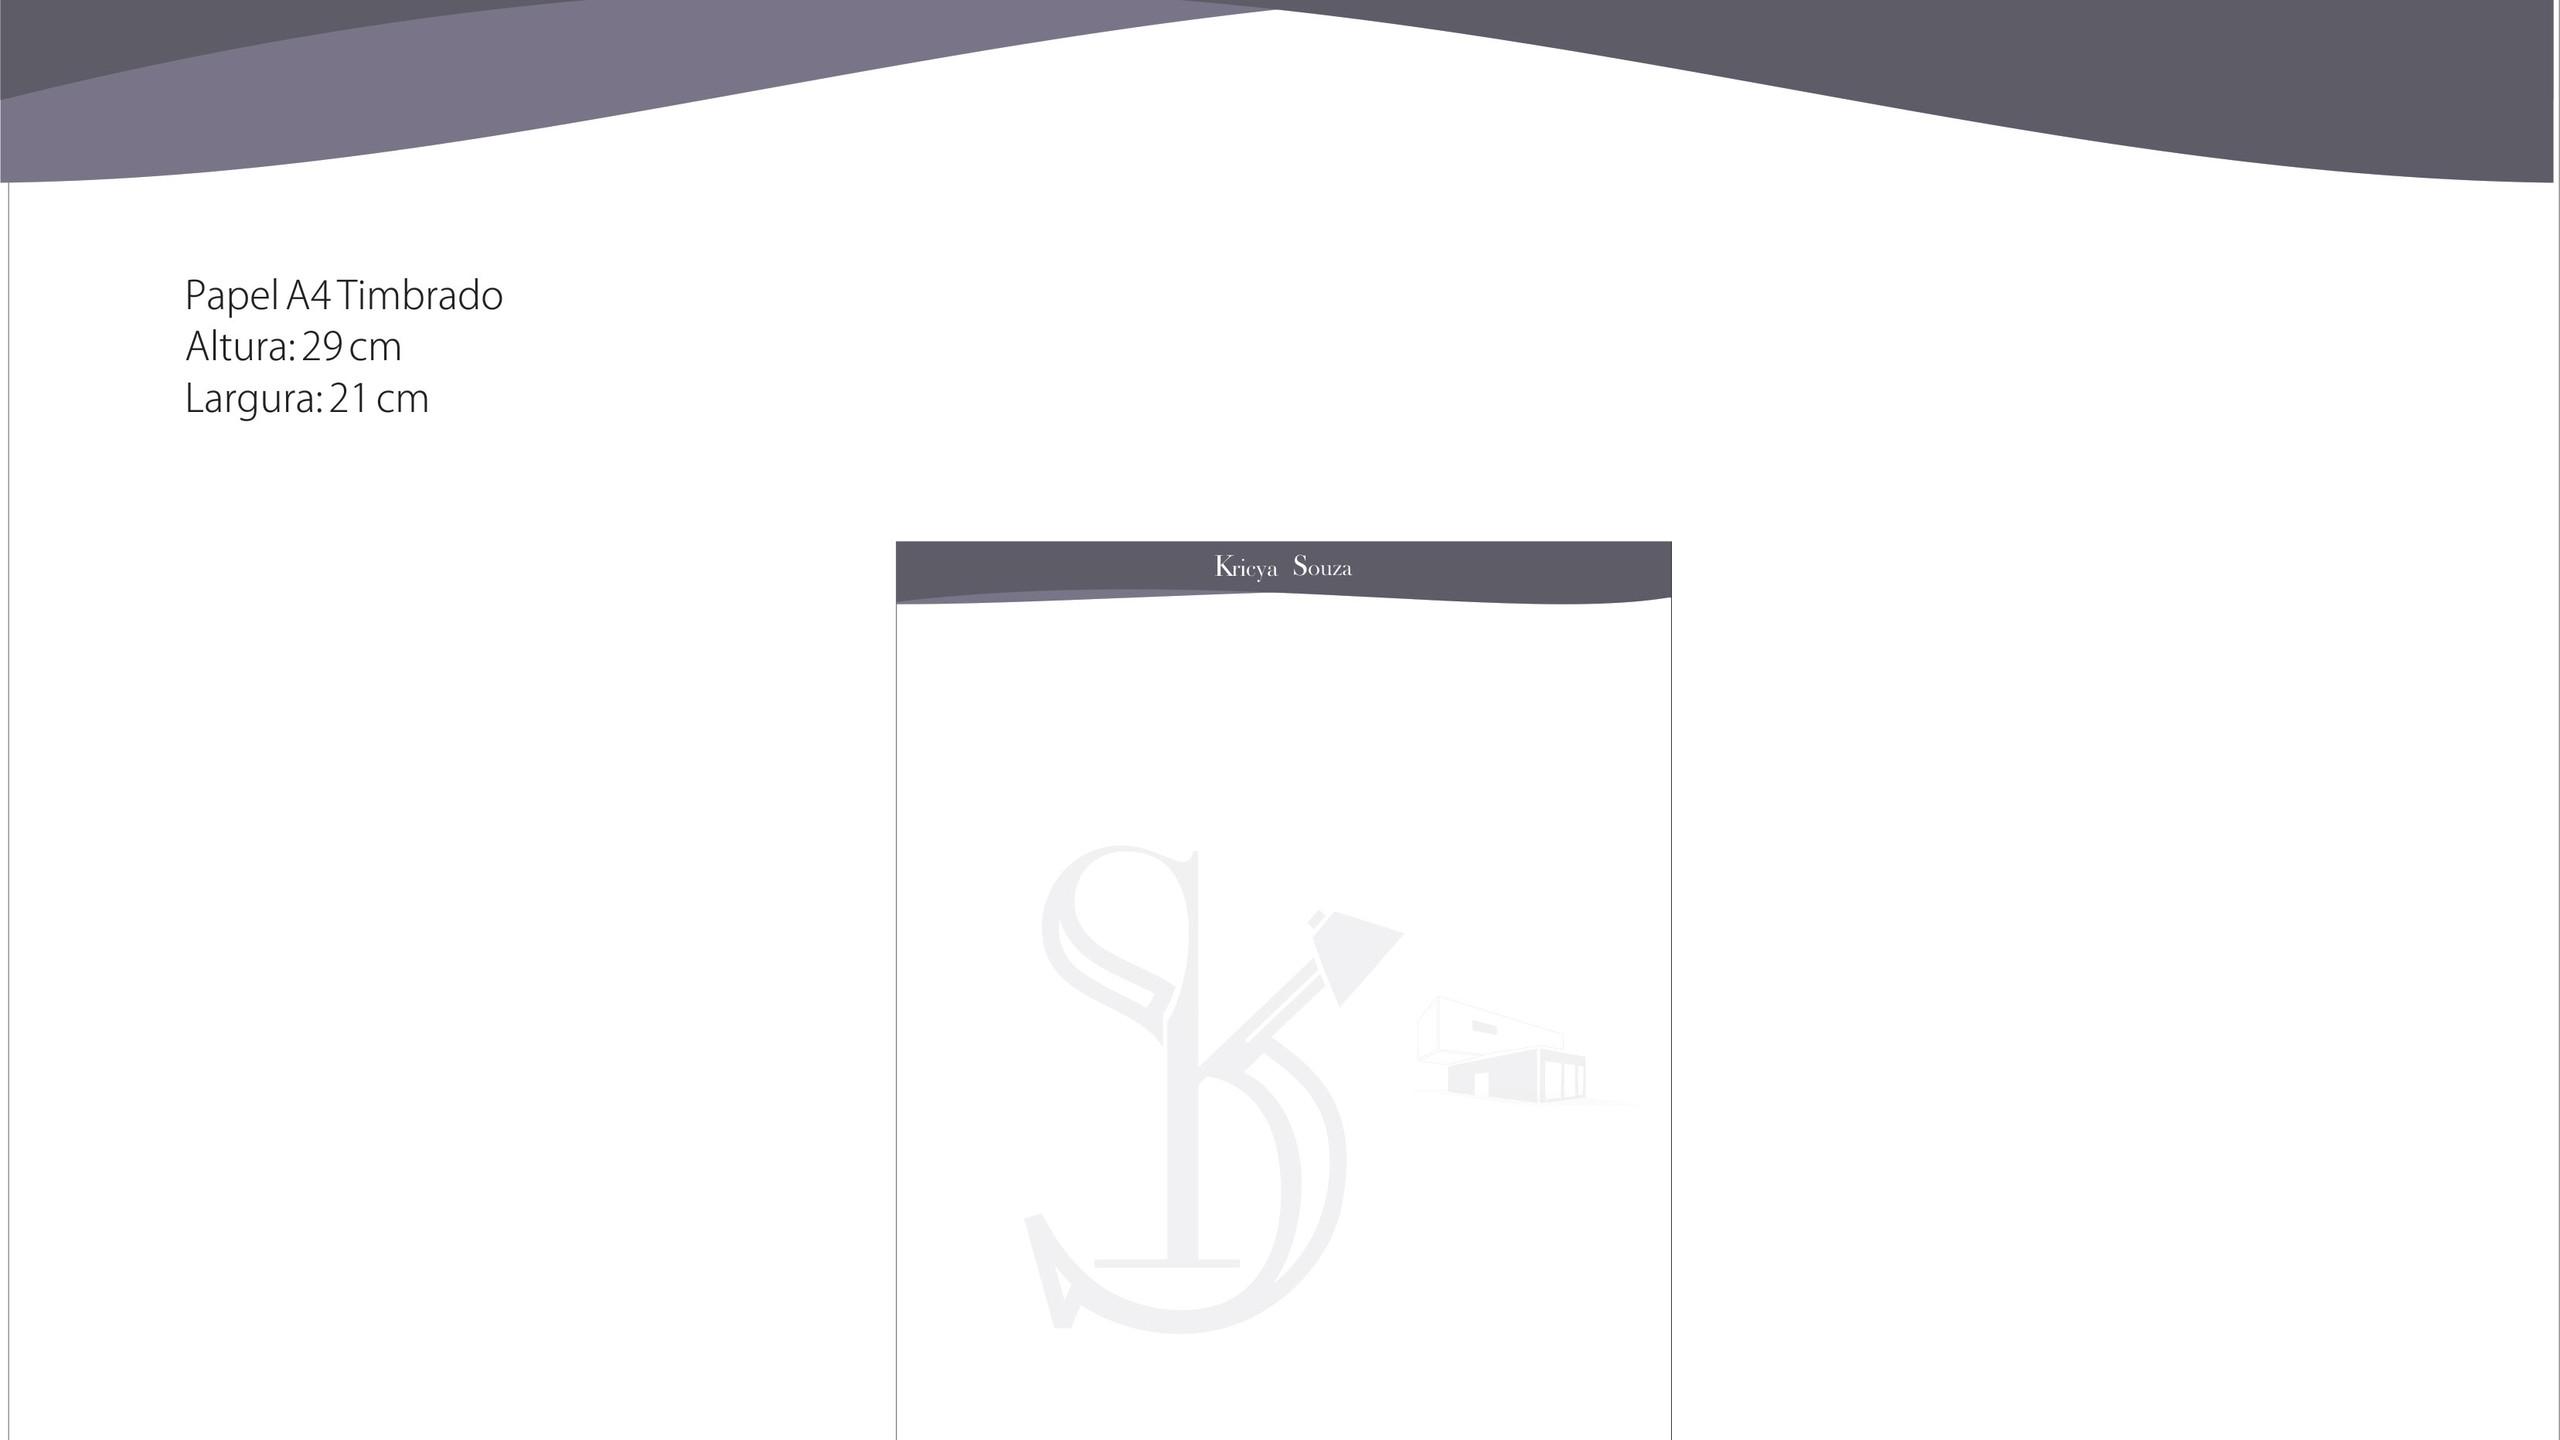 papel timbrado A4